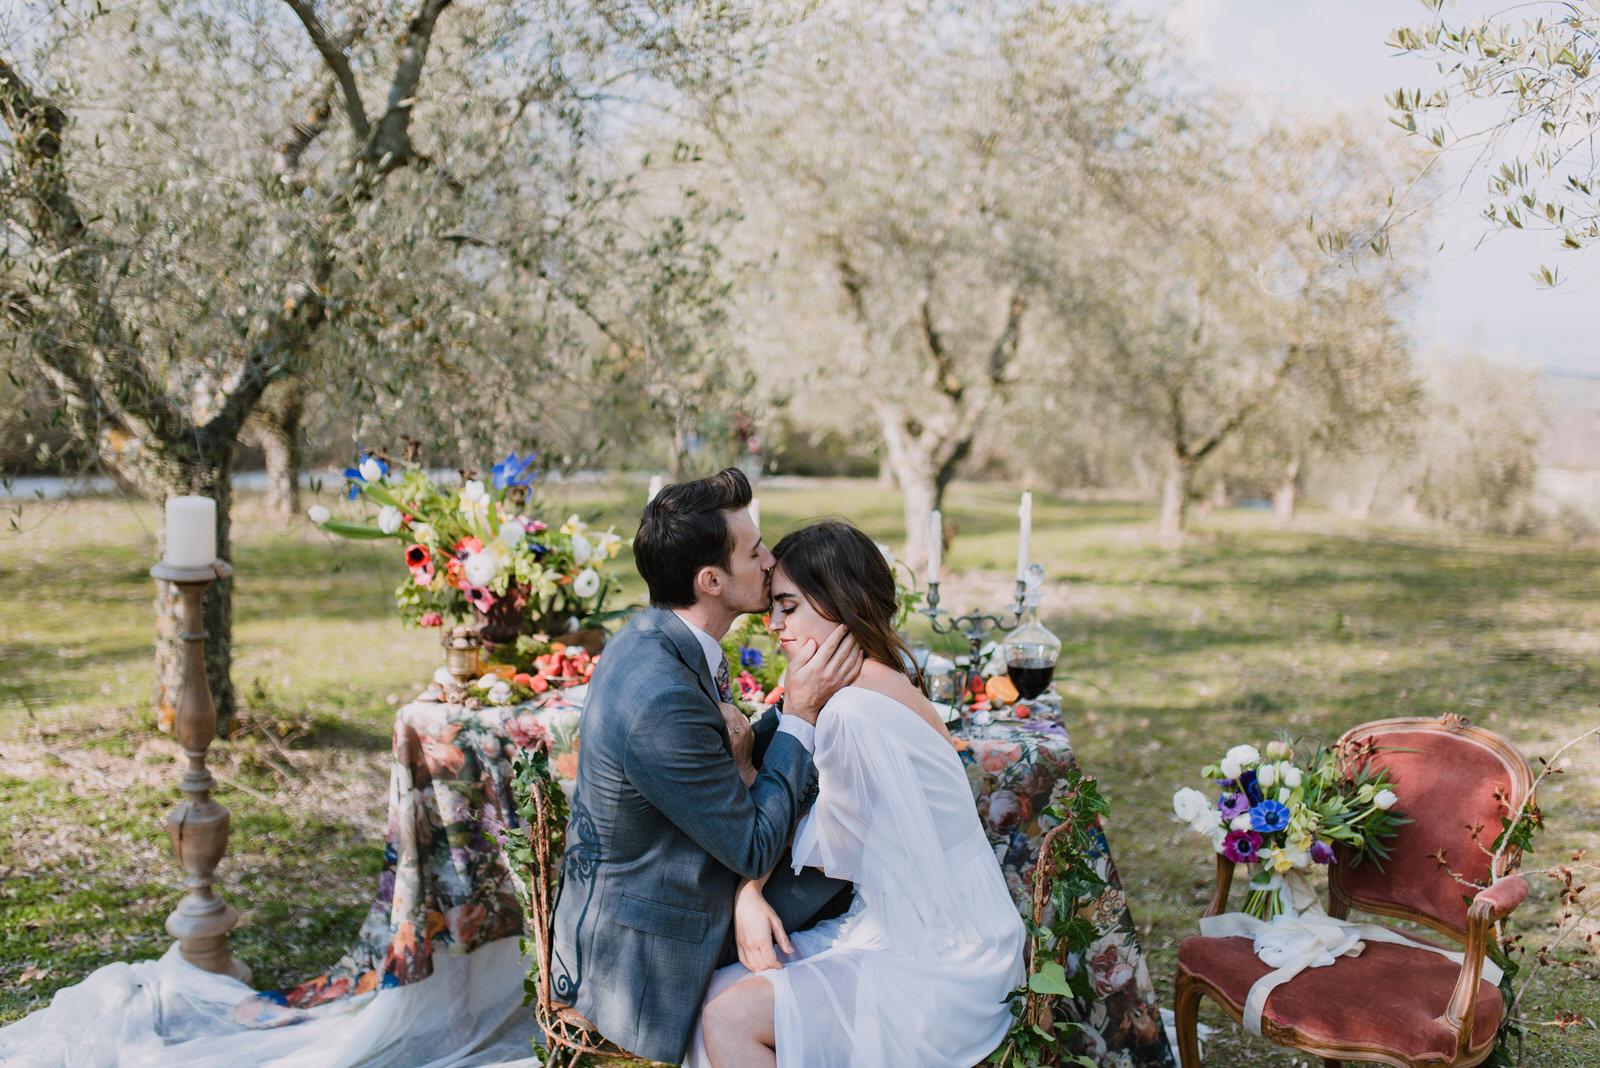 tuscany wedding photography 31.jpg